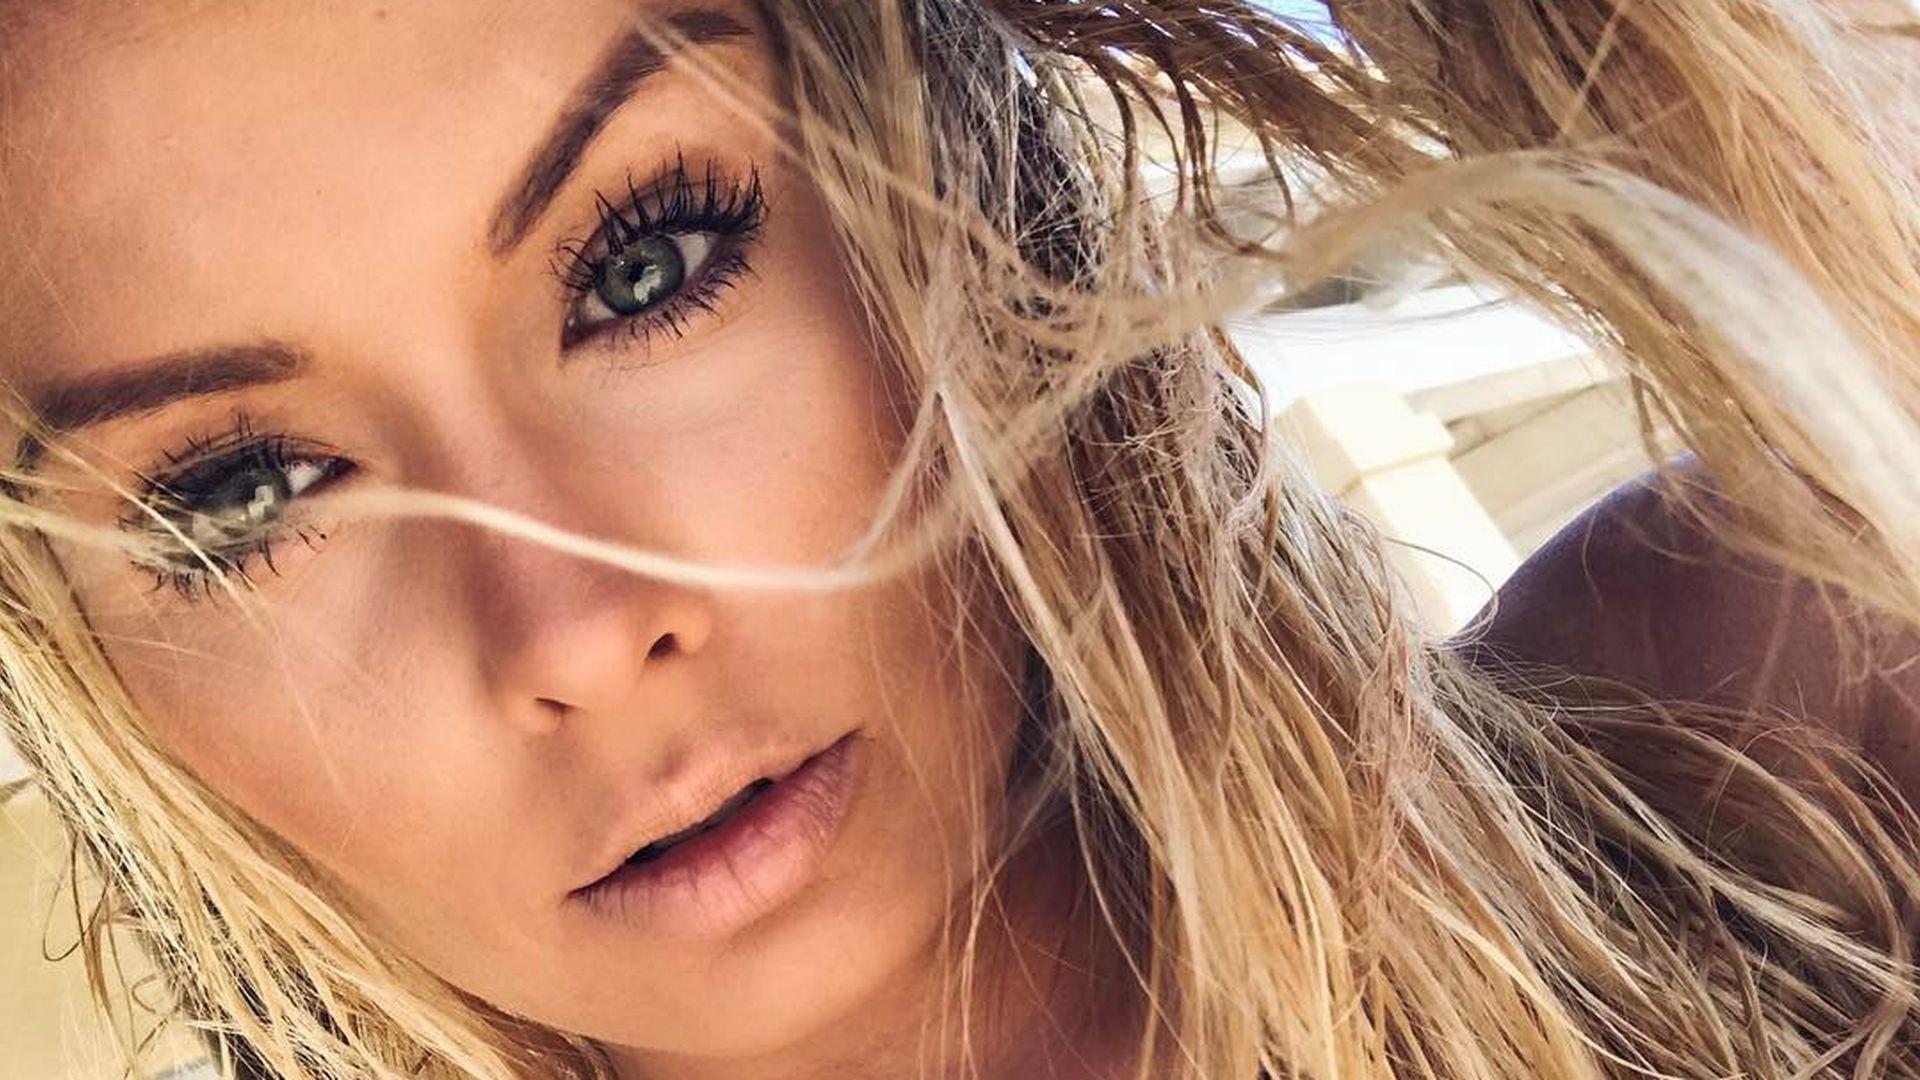 Snapchat Mandy Lange nudes (46 photos), Pussy, Sideboobs, Twitter, bra 2019